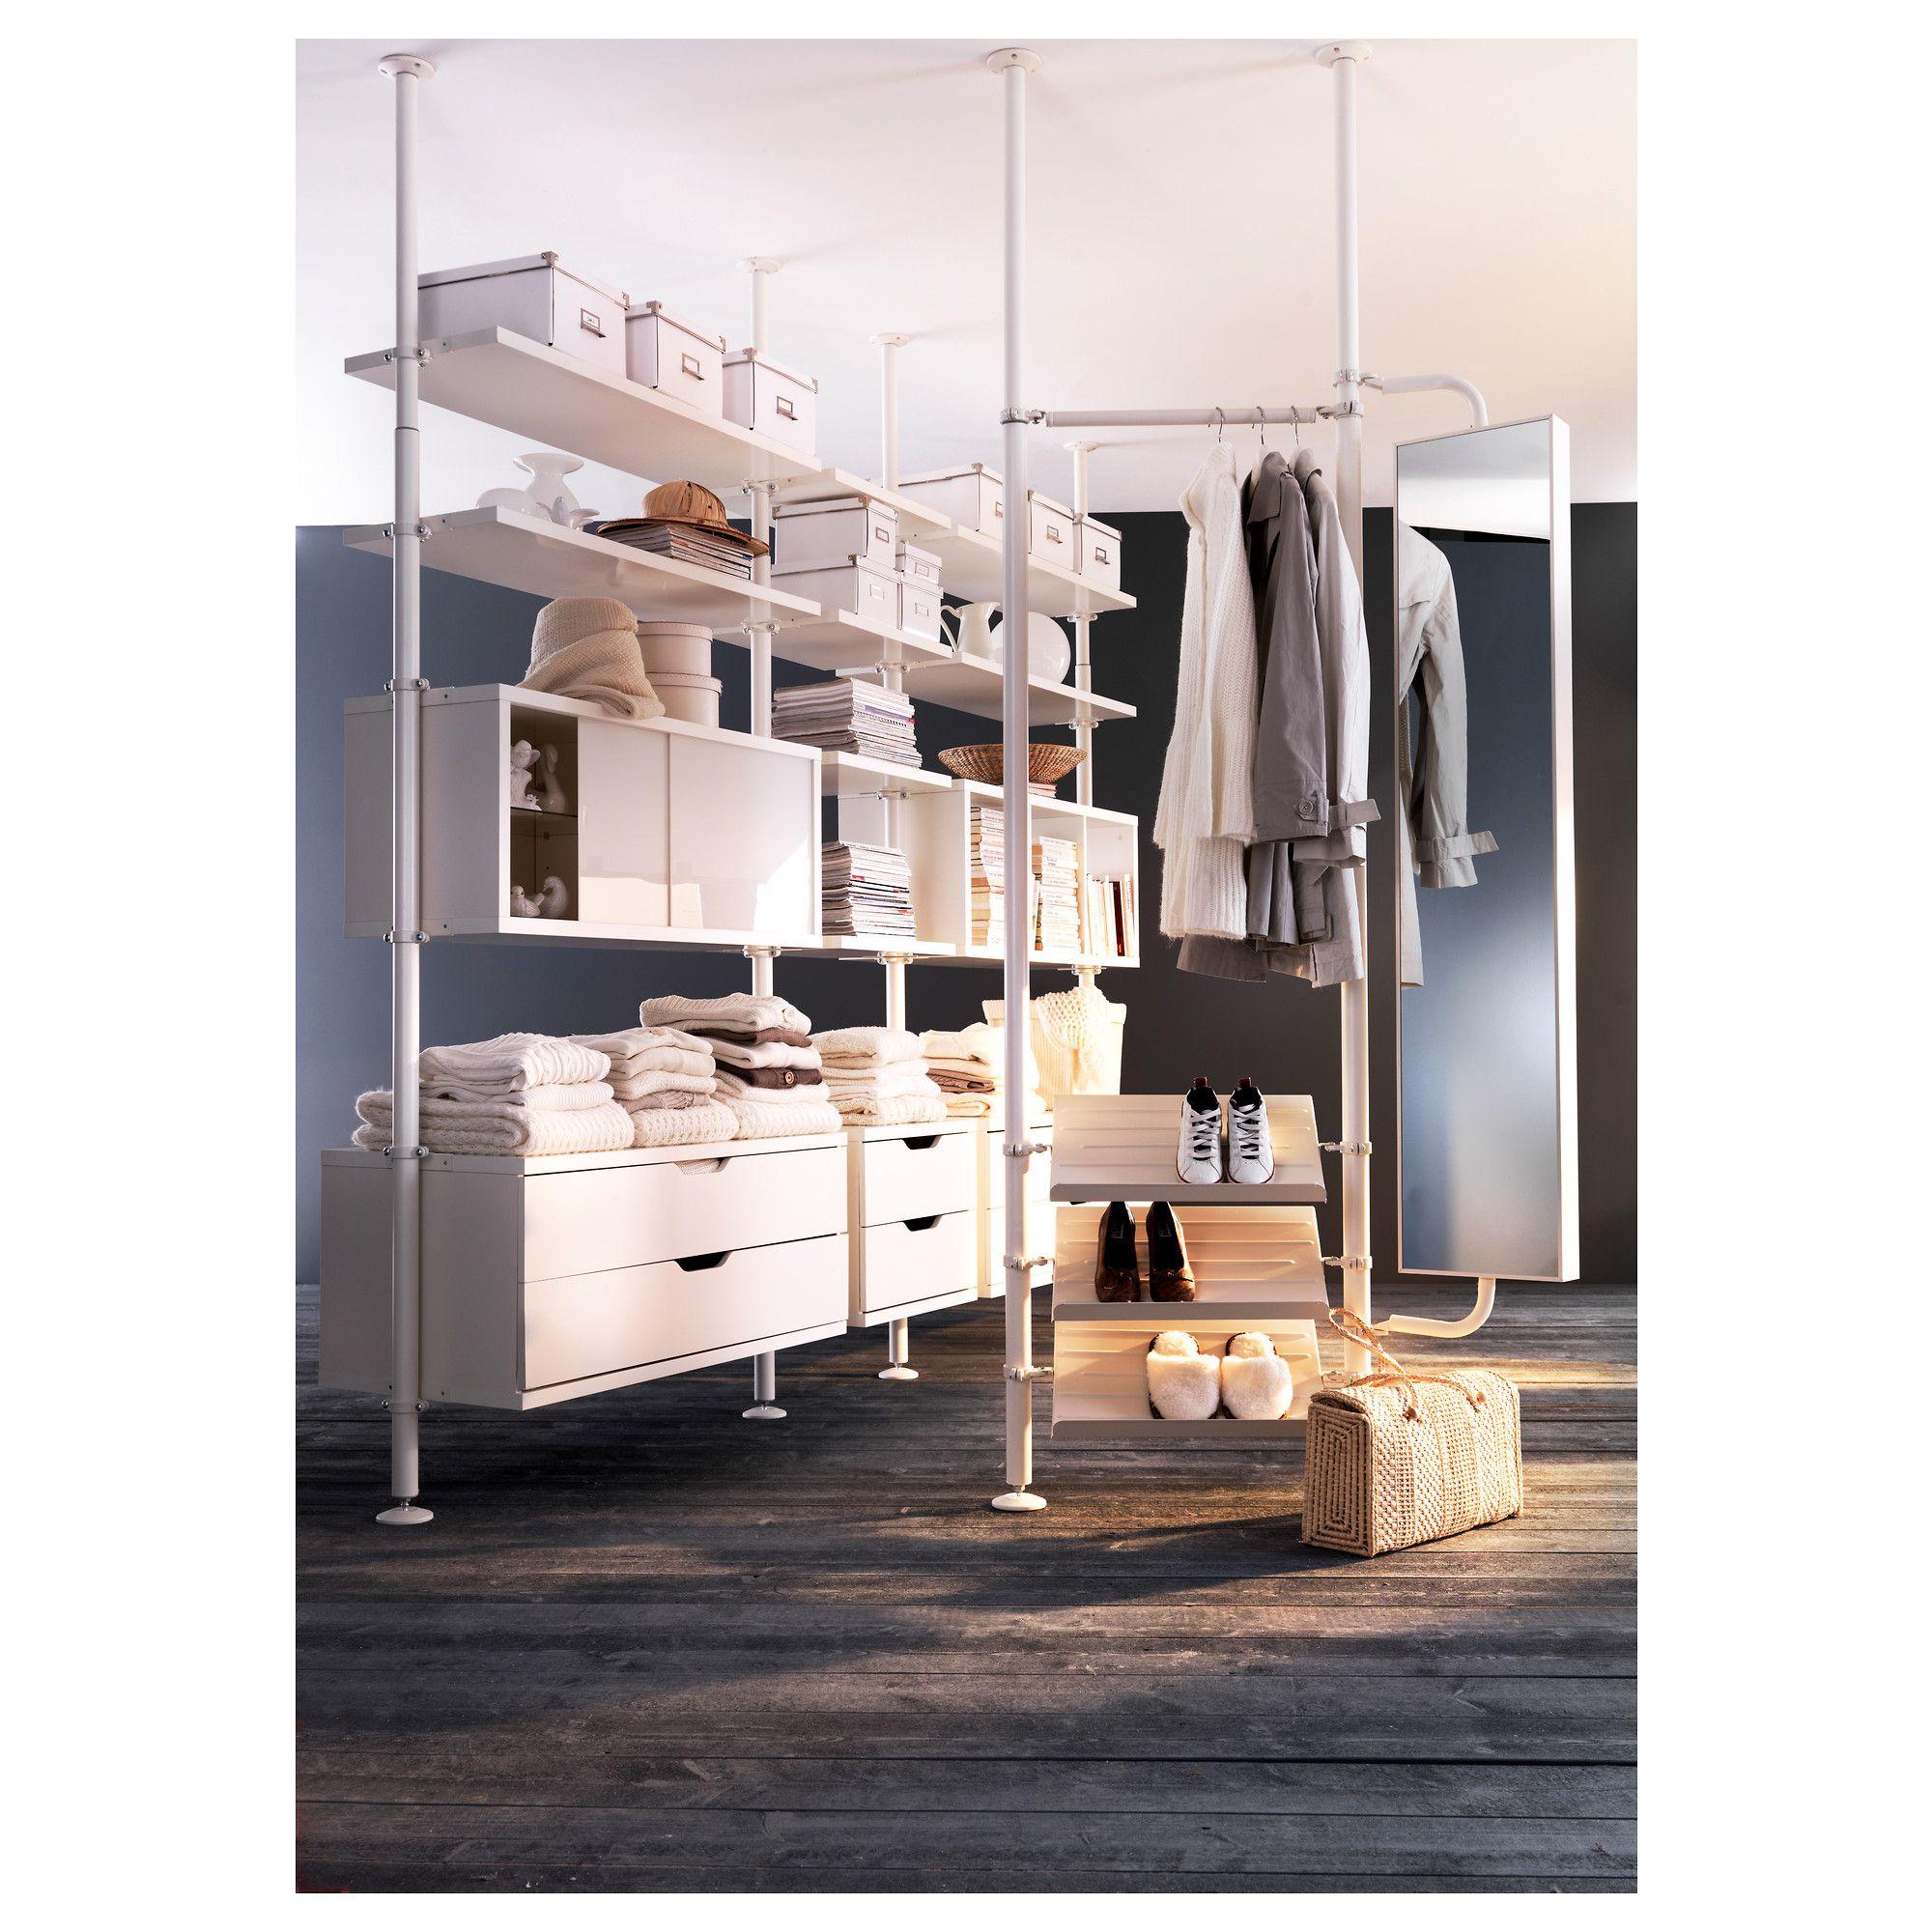 US Furniture and Home Furnishings Ikea closet, Ikea